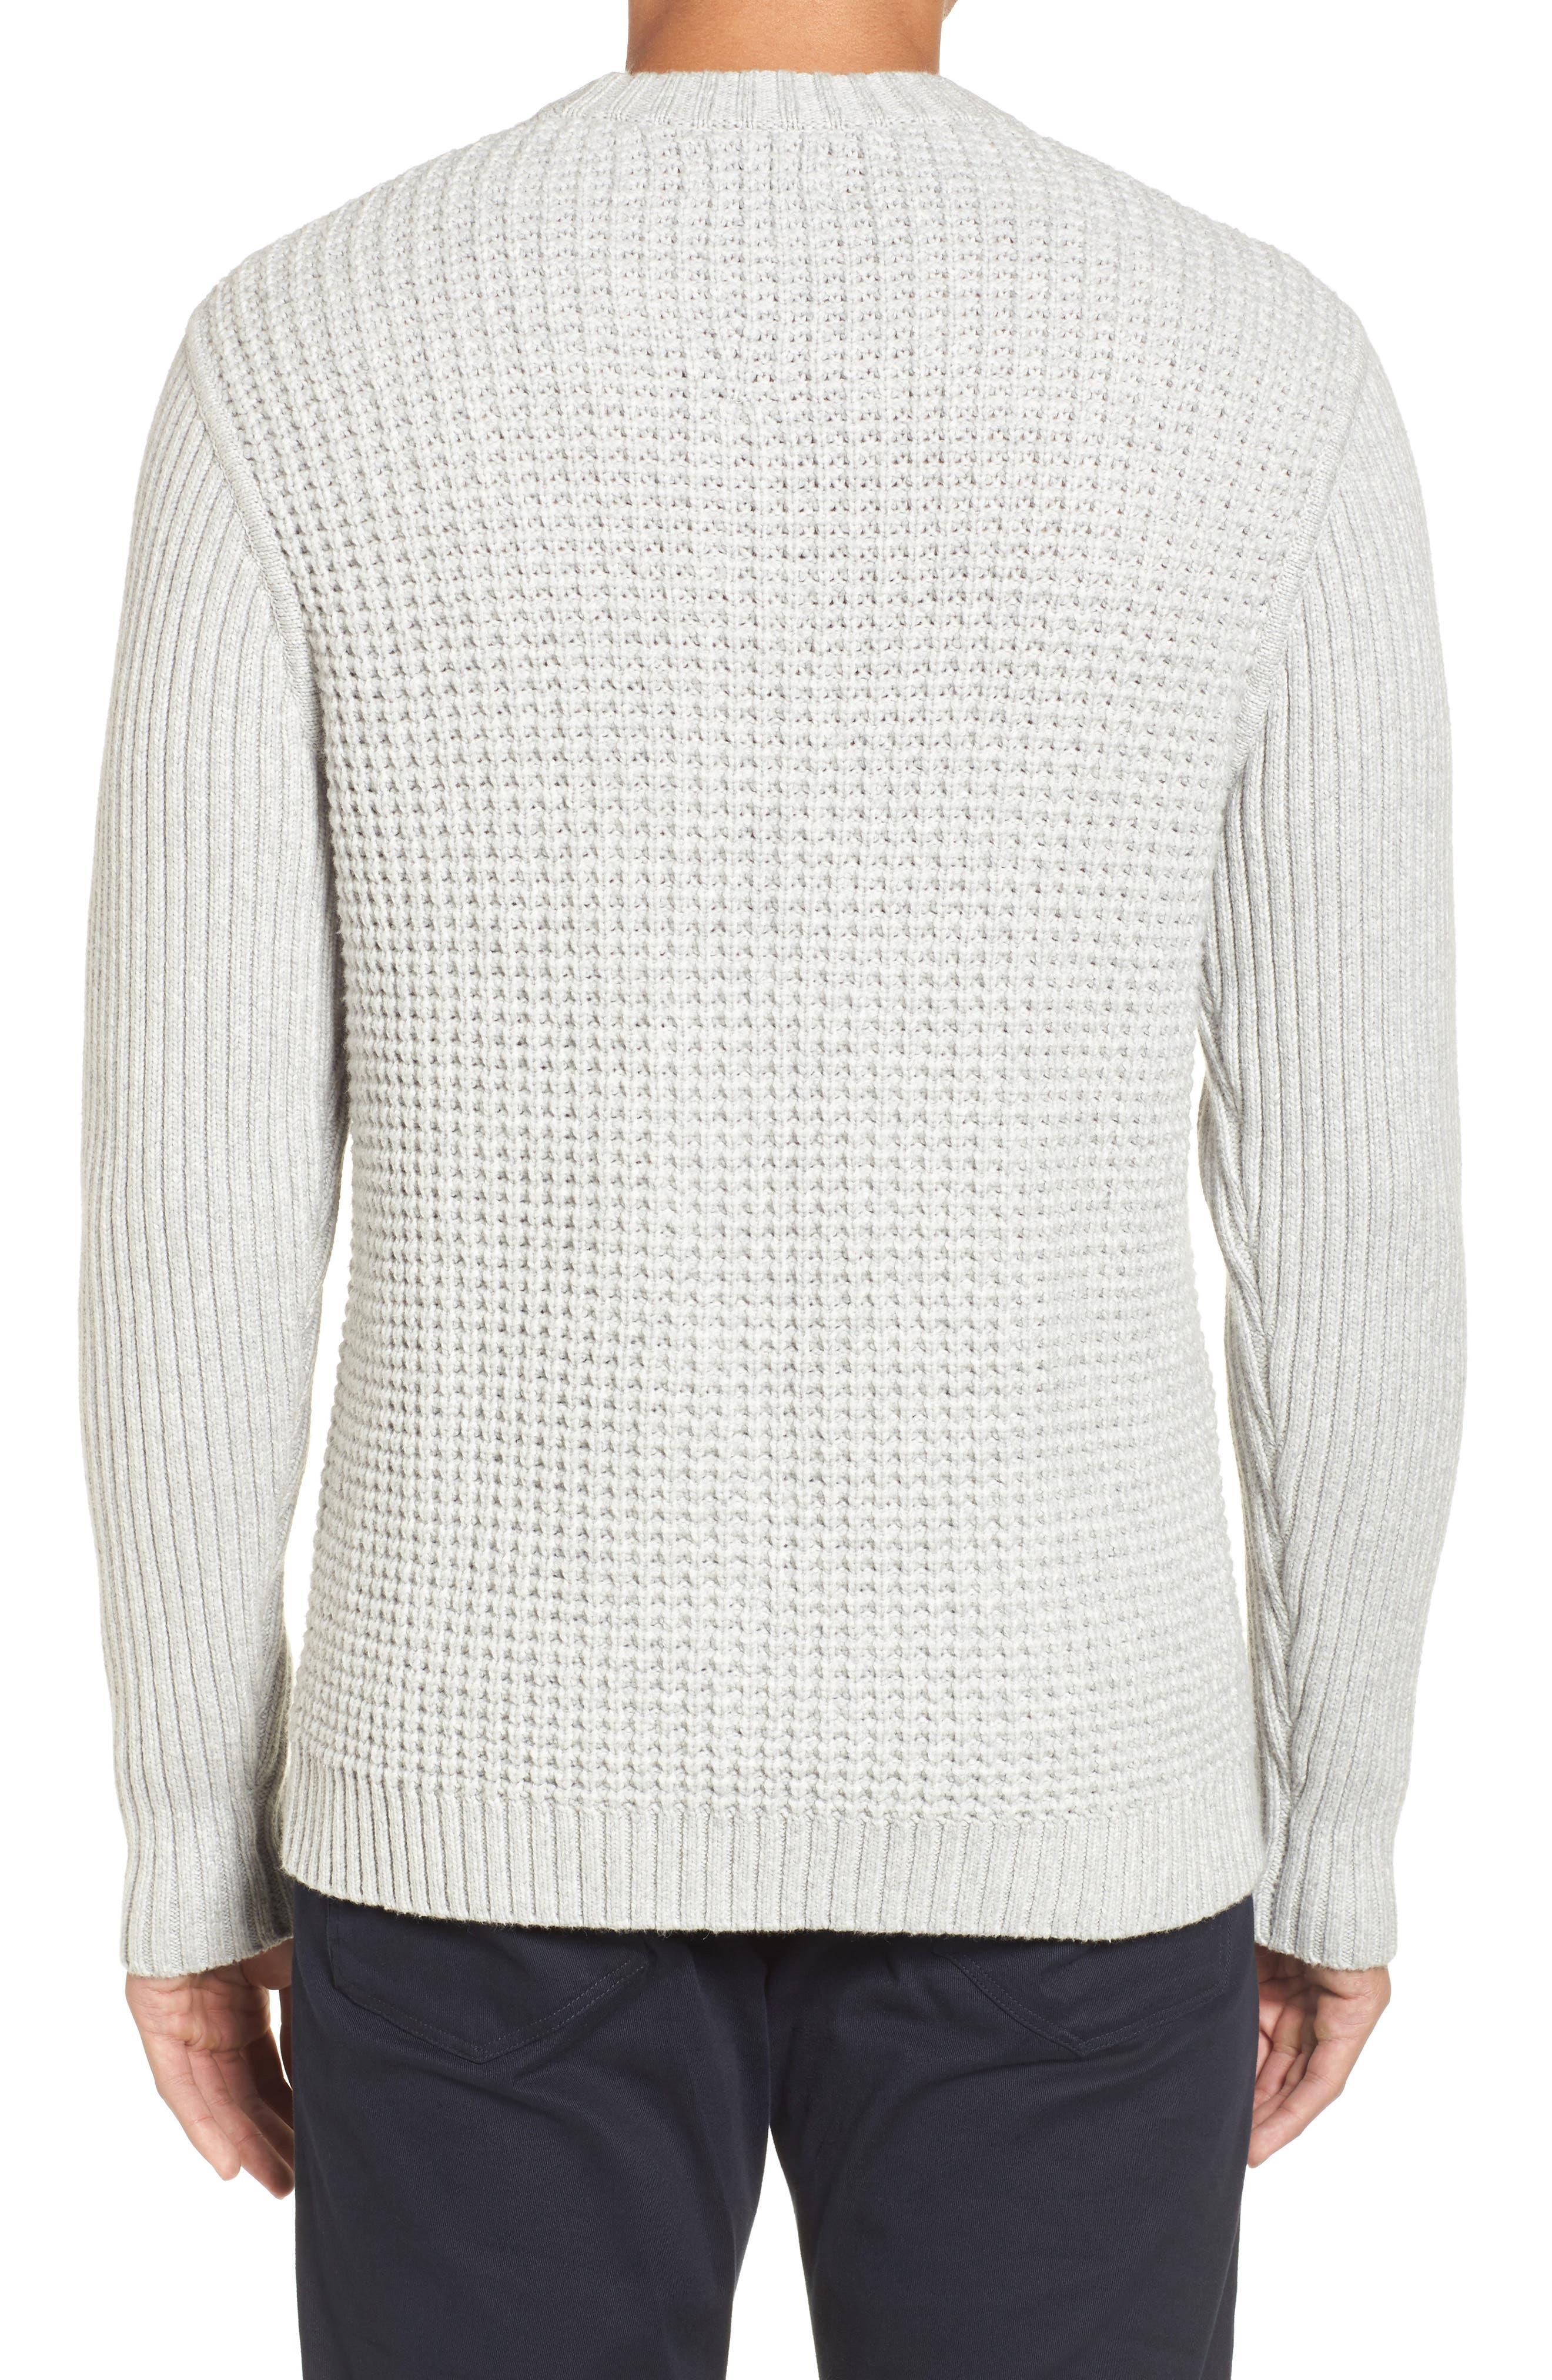 Heavyweight Mixed Knit Crewneck Sweater,                             Alternate thumbnail 3, color,                             Grey Sleet Heather